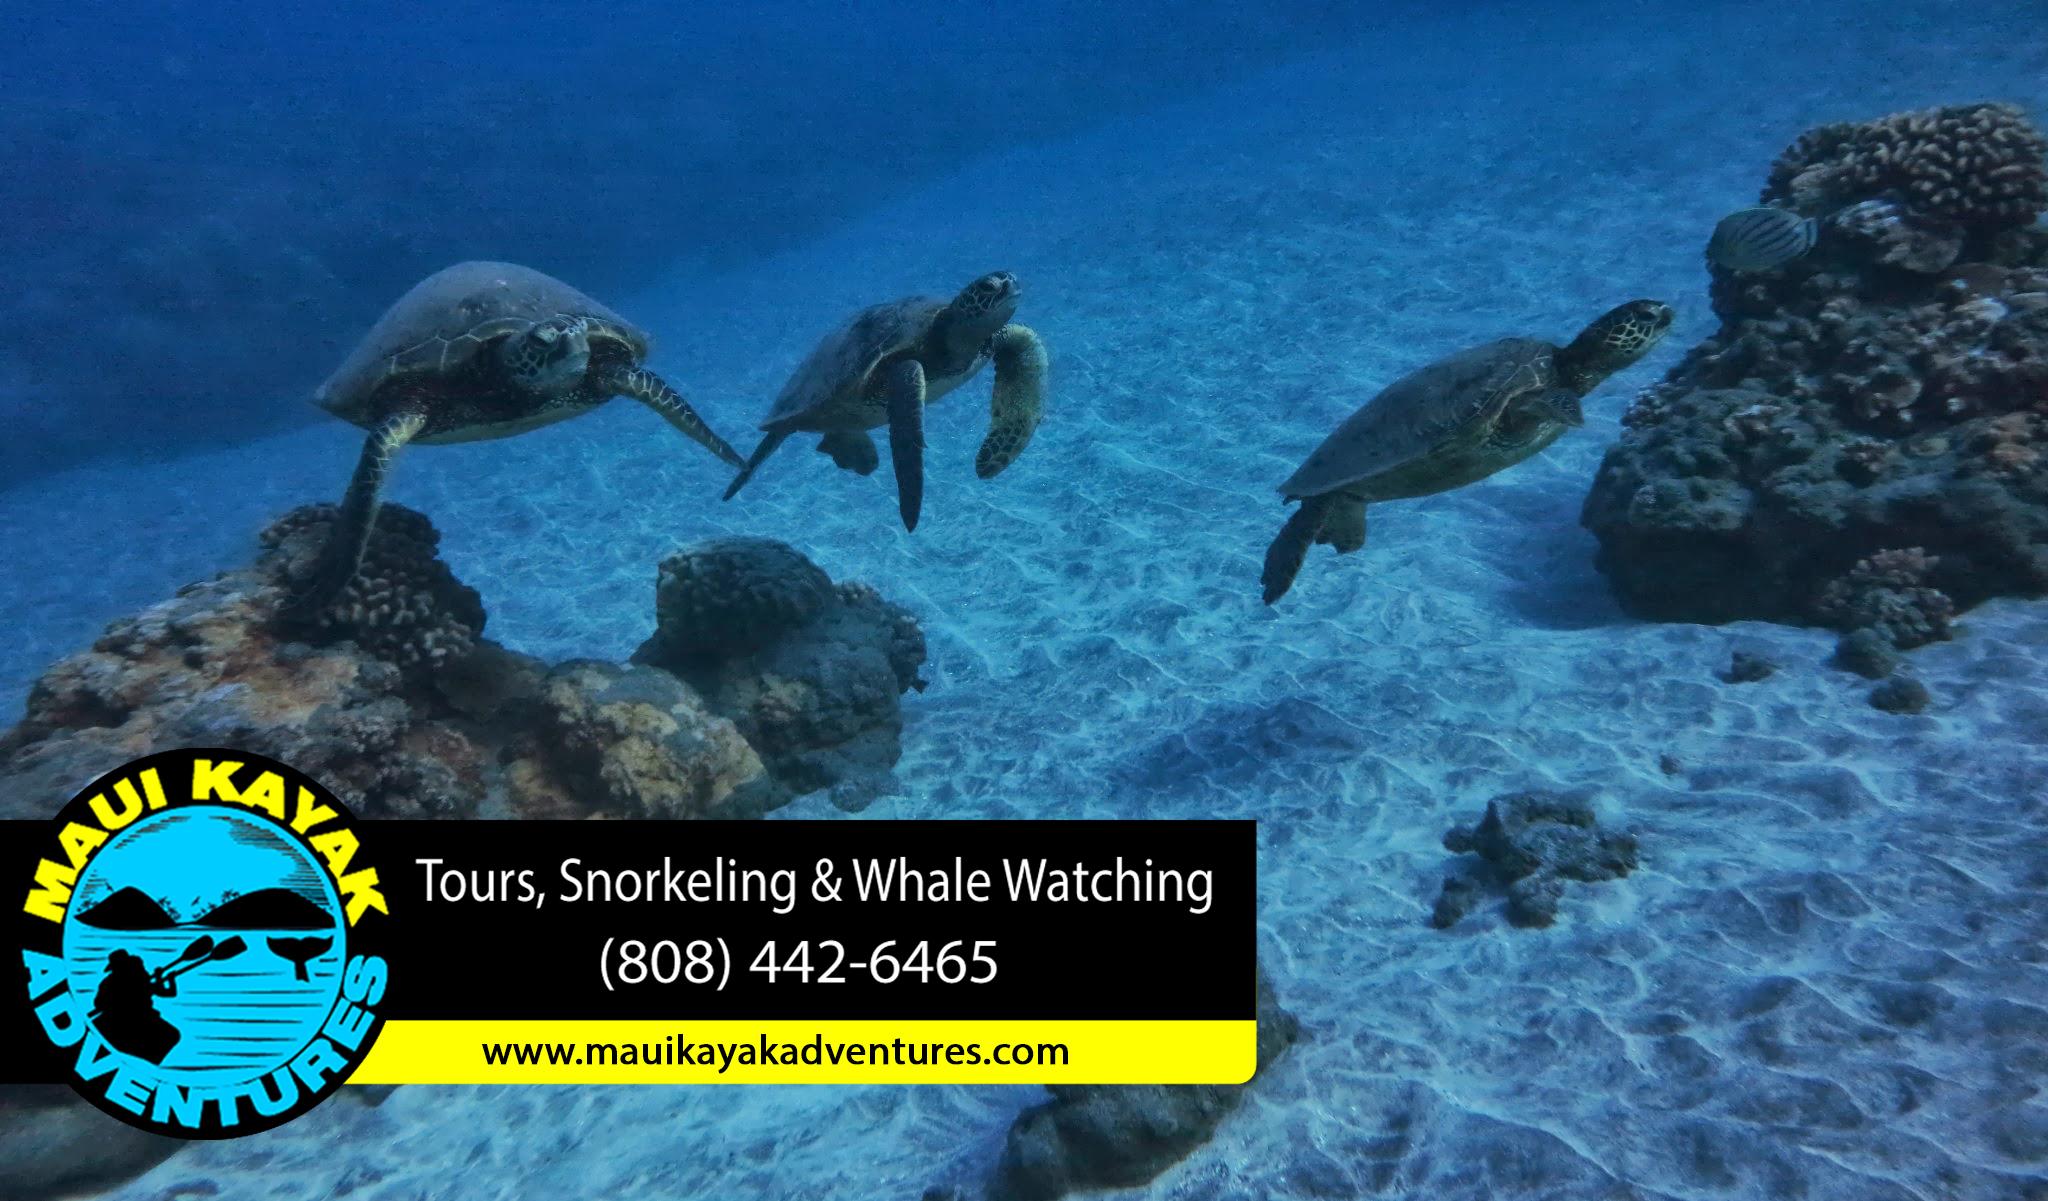 Snorkeling Gear Maui Snorkeling Tours Maui